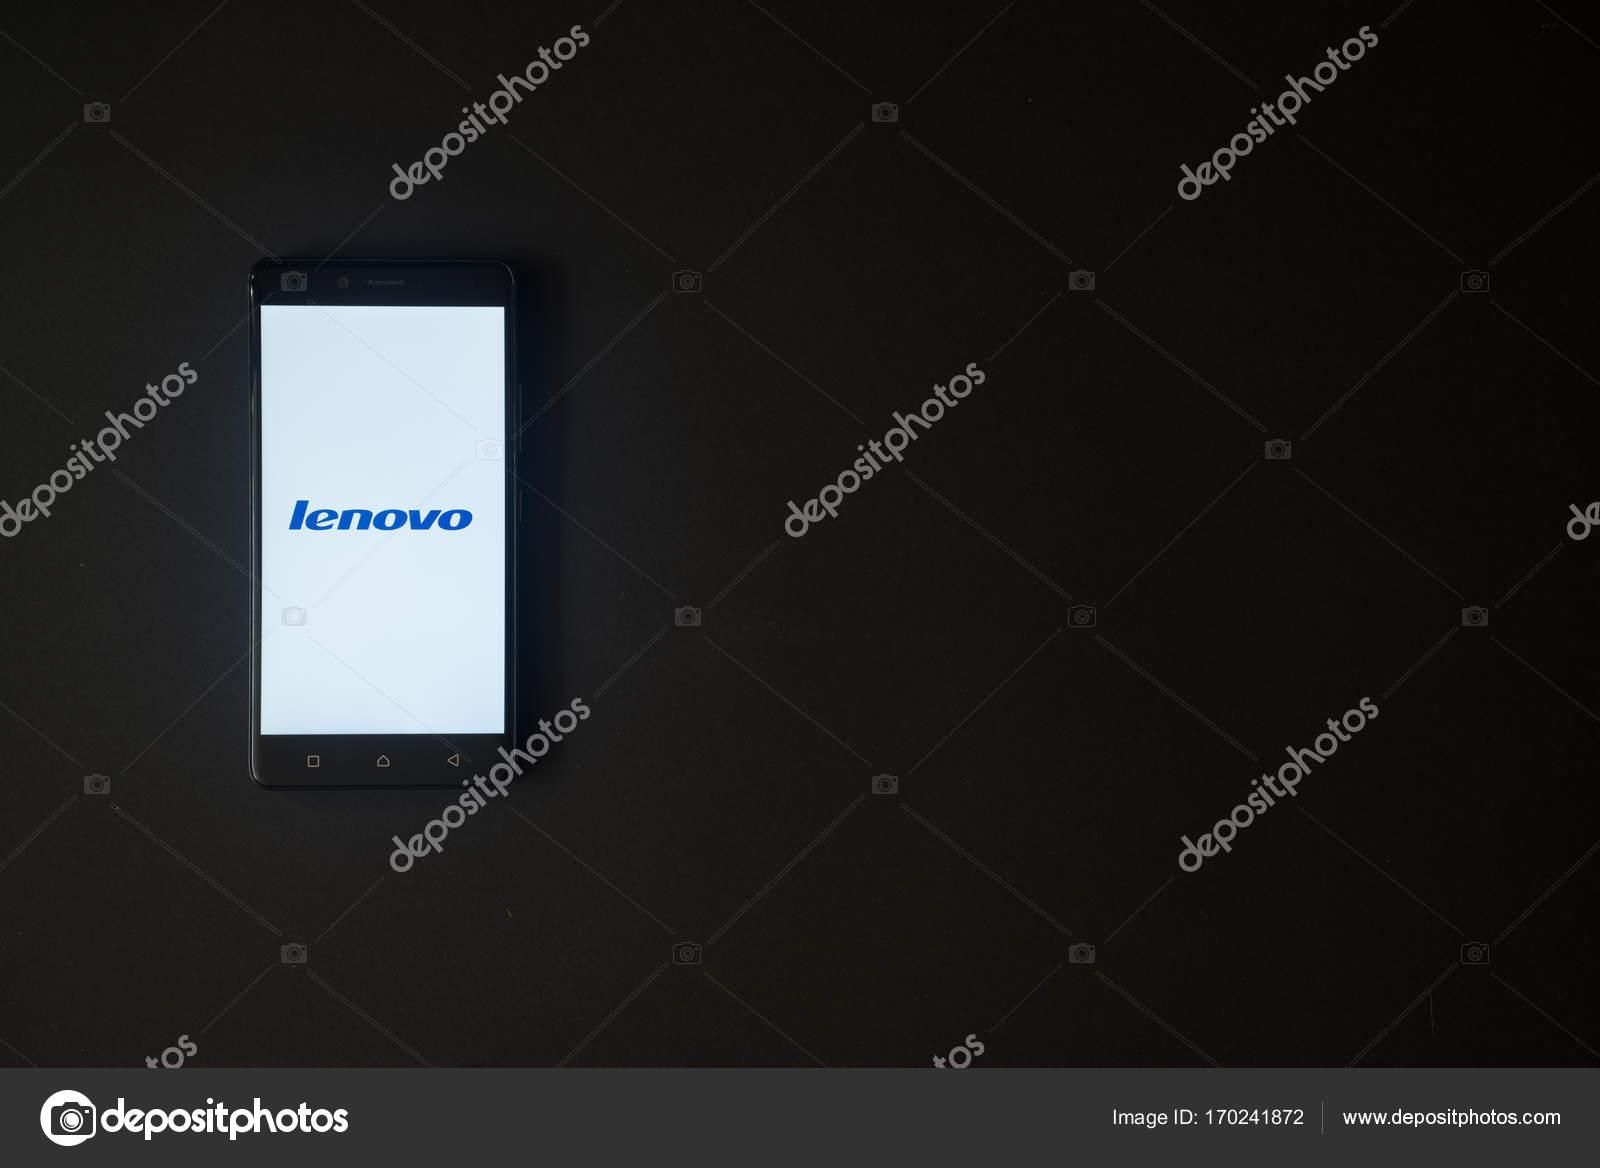 Lenovo logo on smartphone screen on black background – Stock